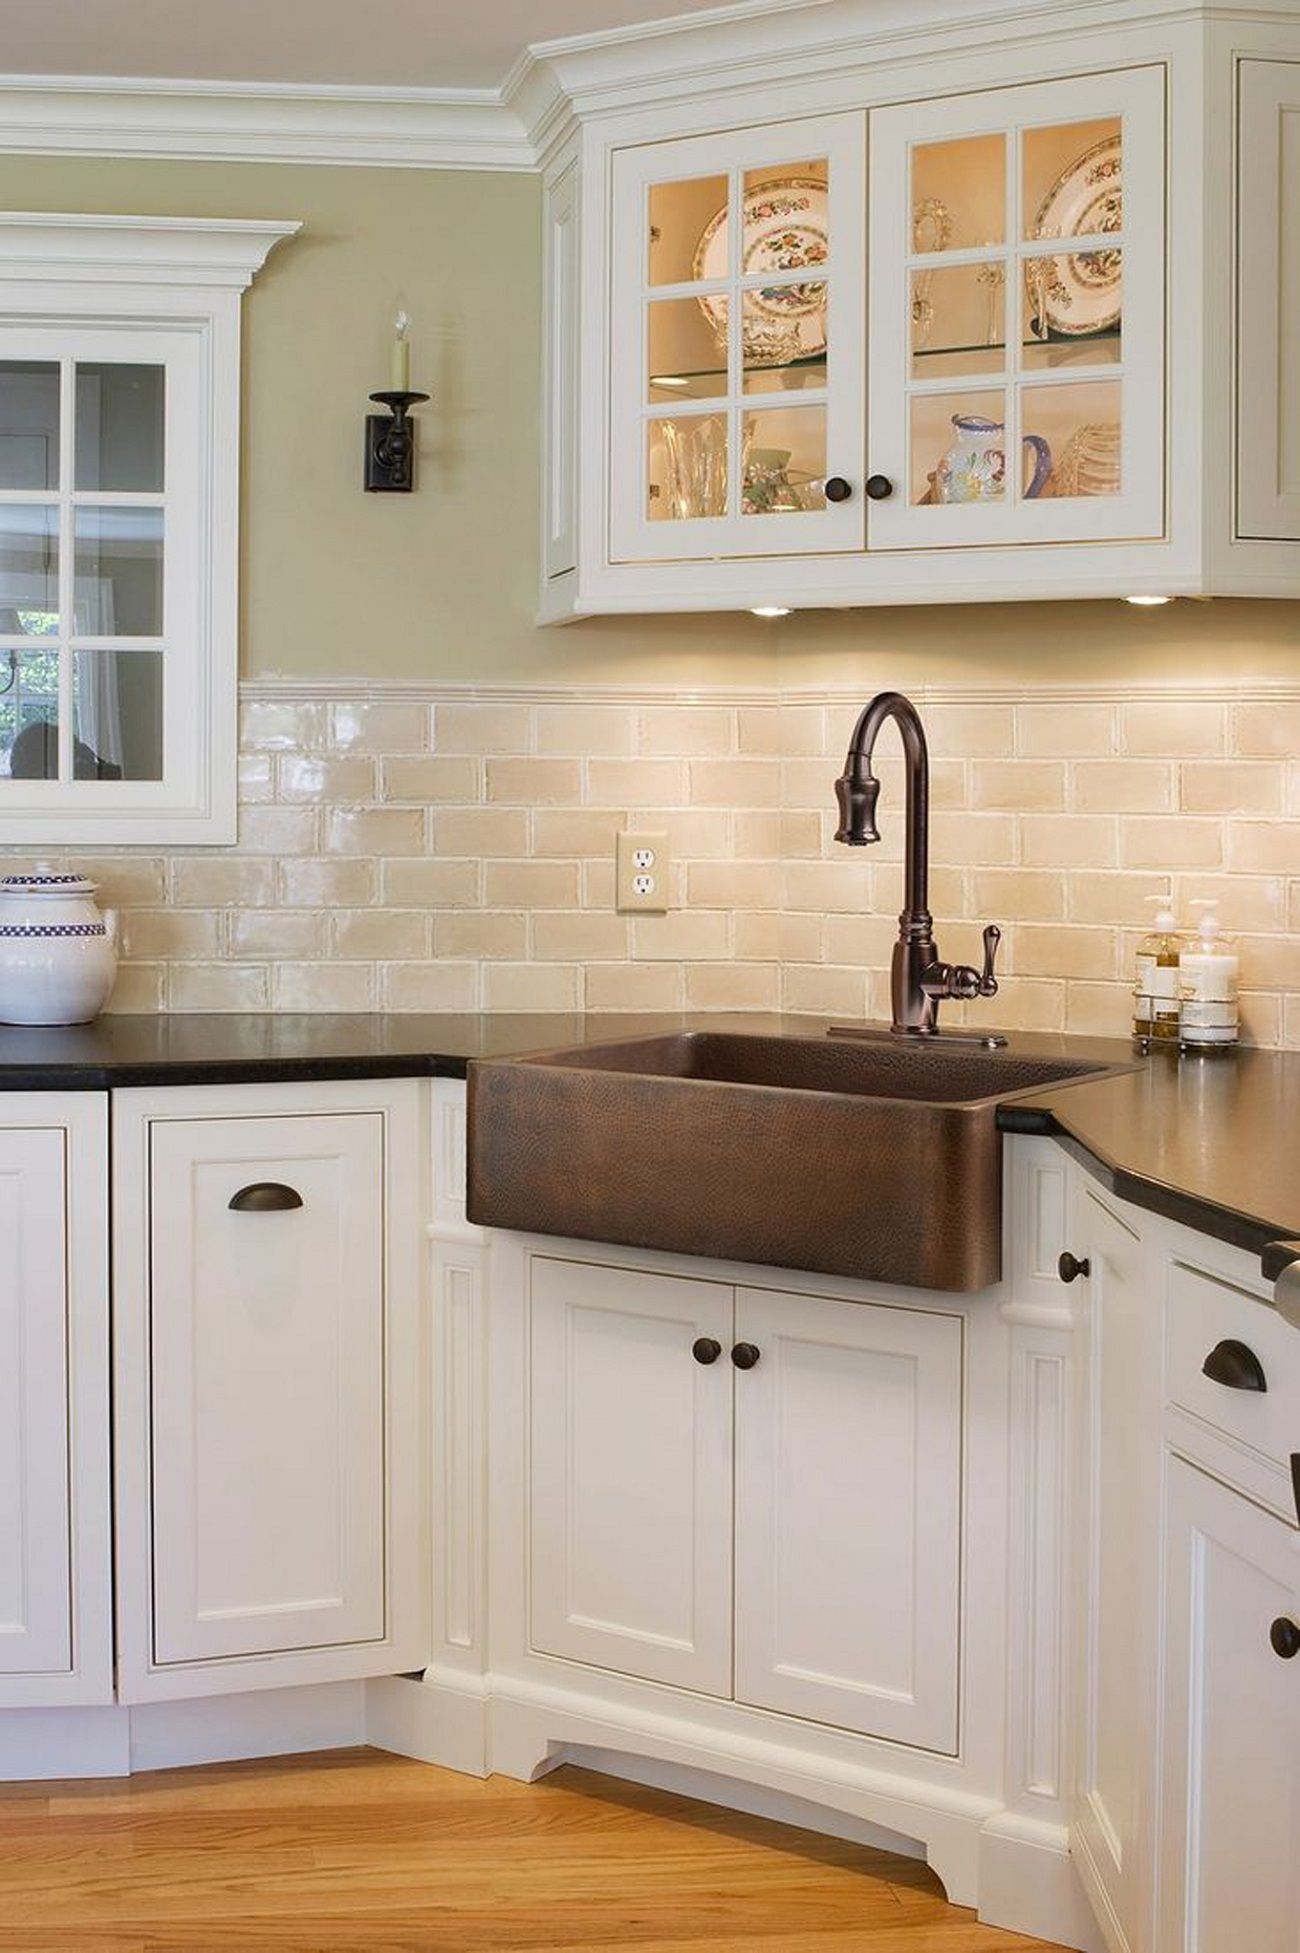 Kitchen Off White Subway Tile White Cabinets Minimalist